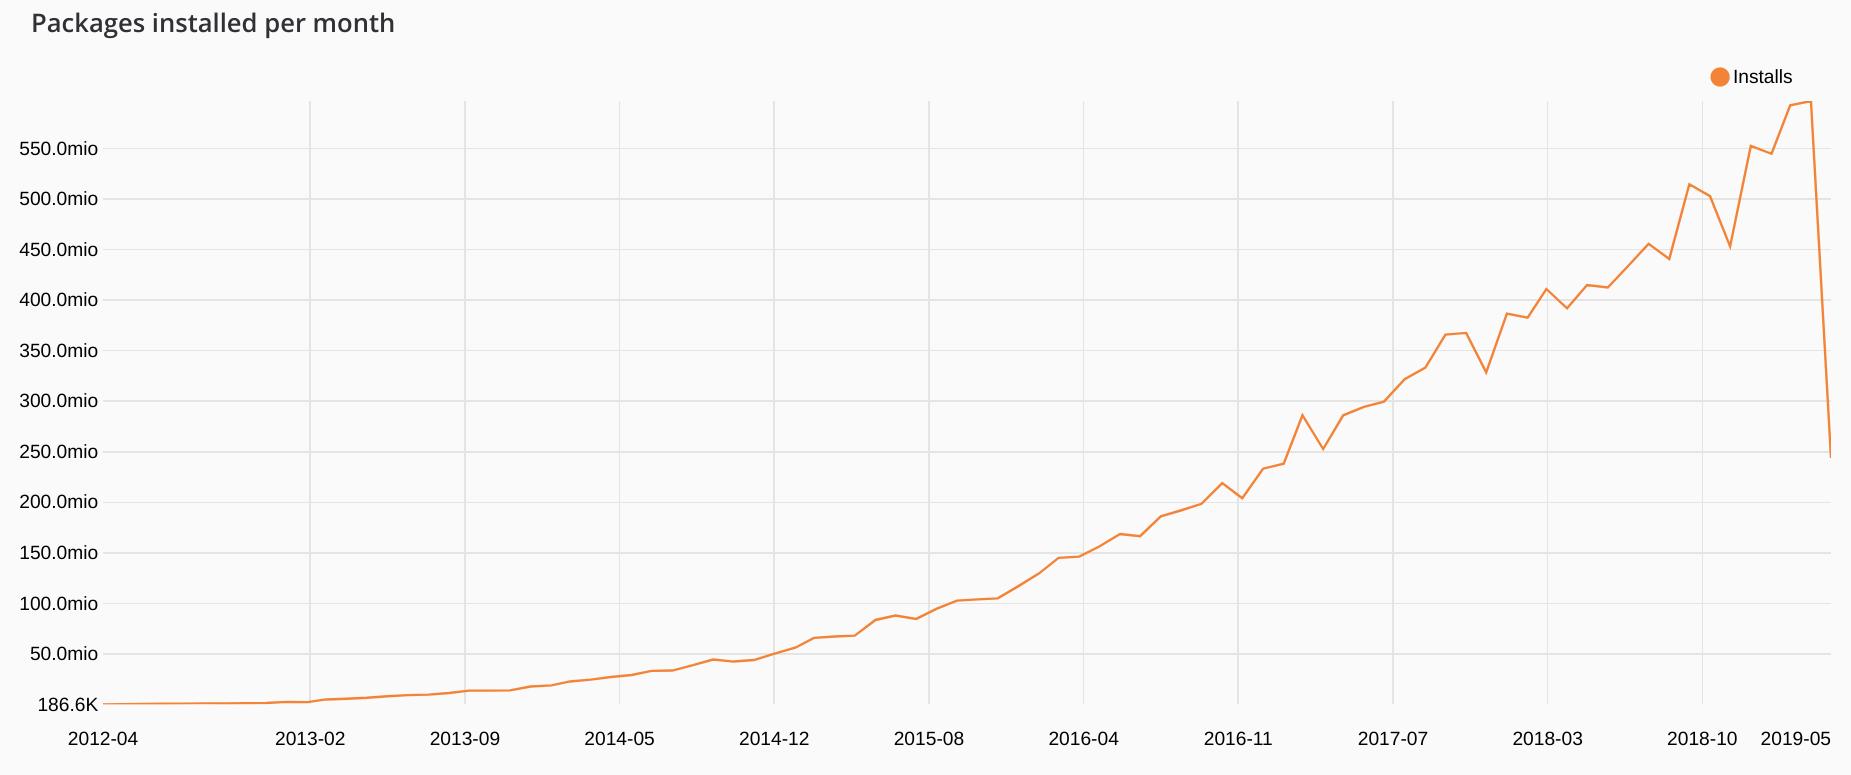 PHP 早已不是十年前的模样A